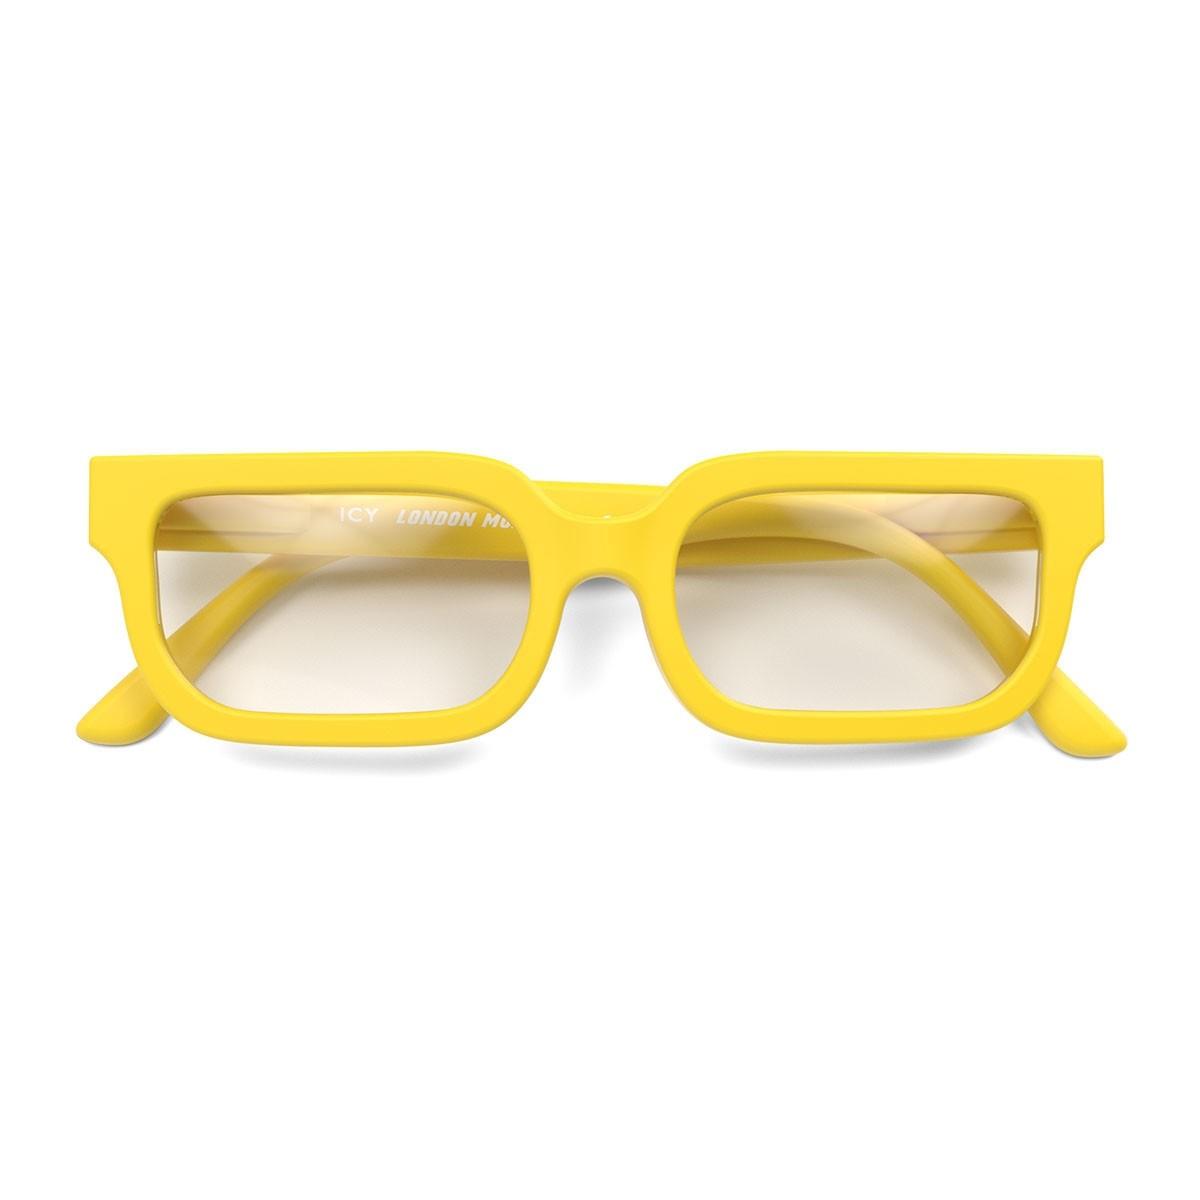 London Mole Icy Blue Blocker Glasses Yellow